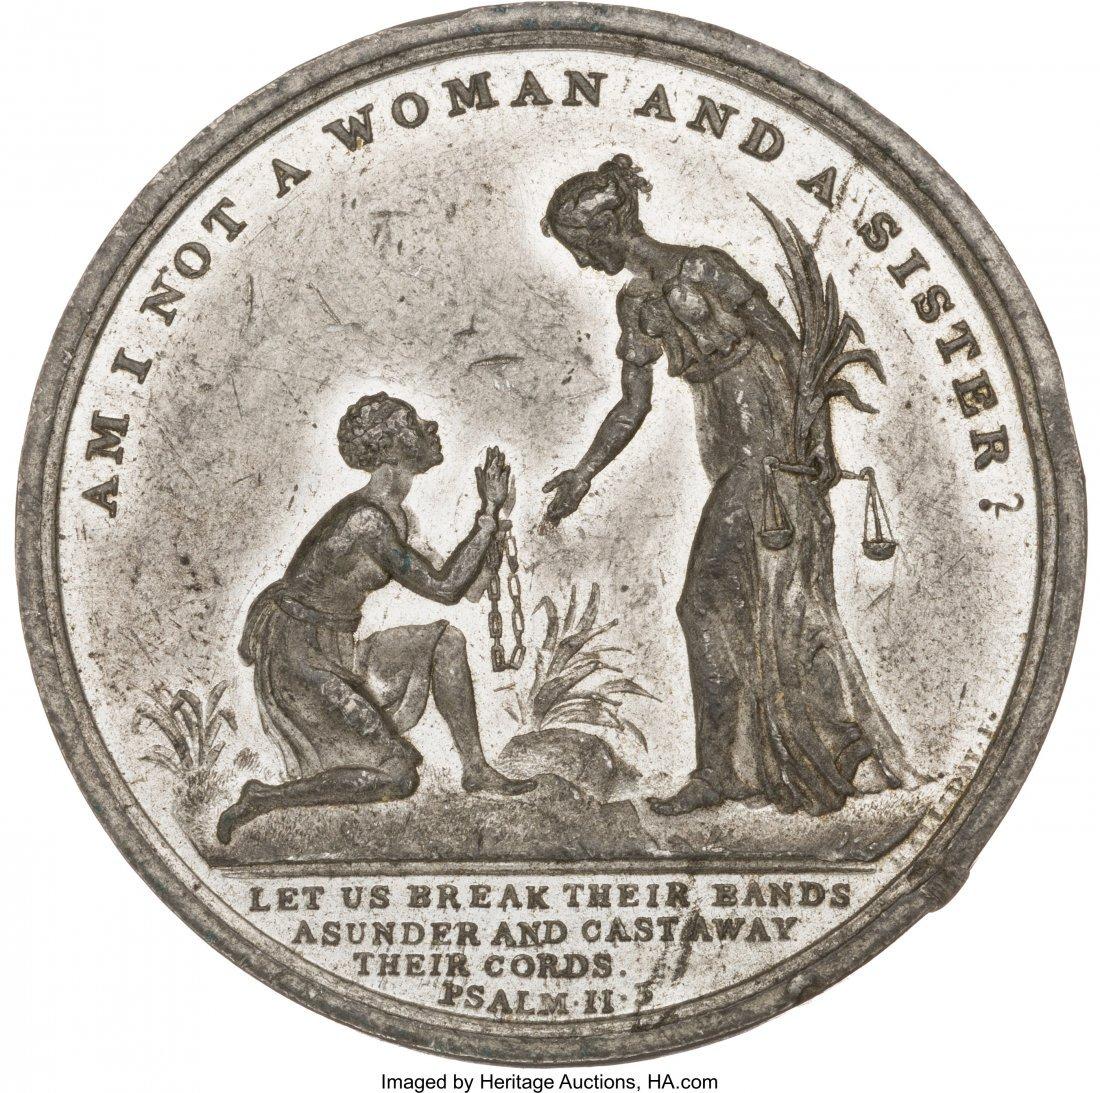 43122: African Americana: Large Anti-Slavery Medal. 41